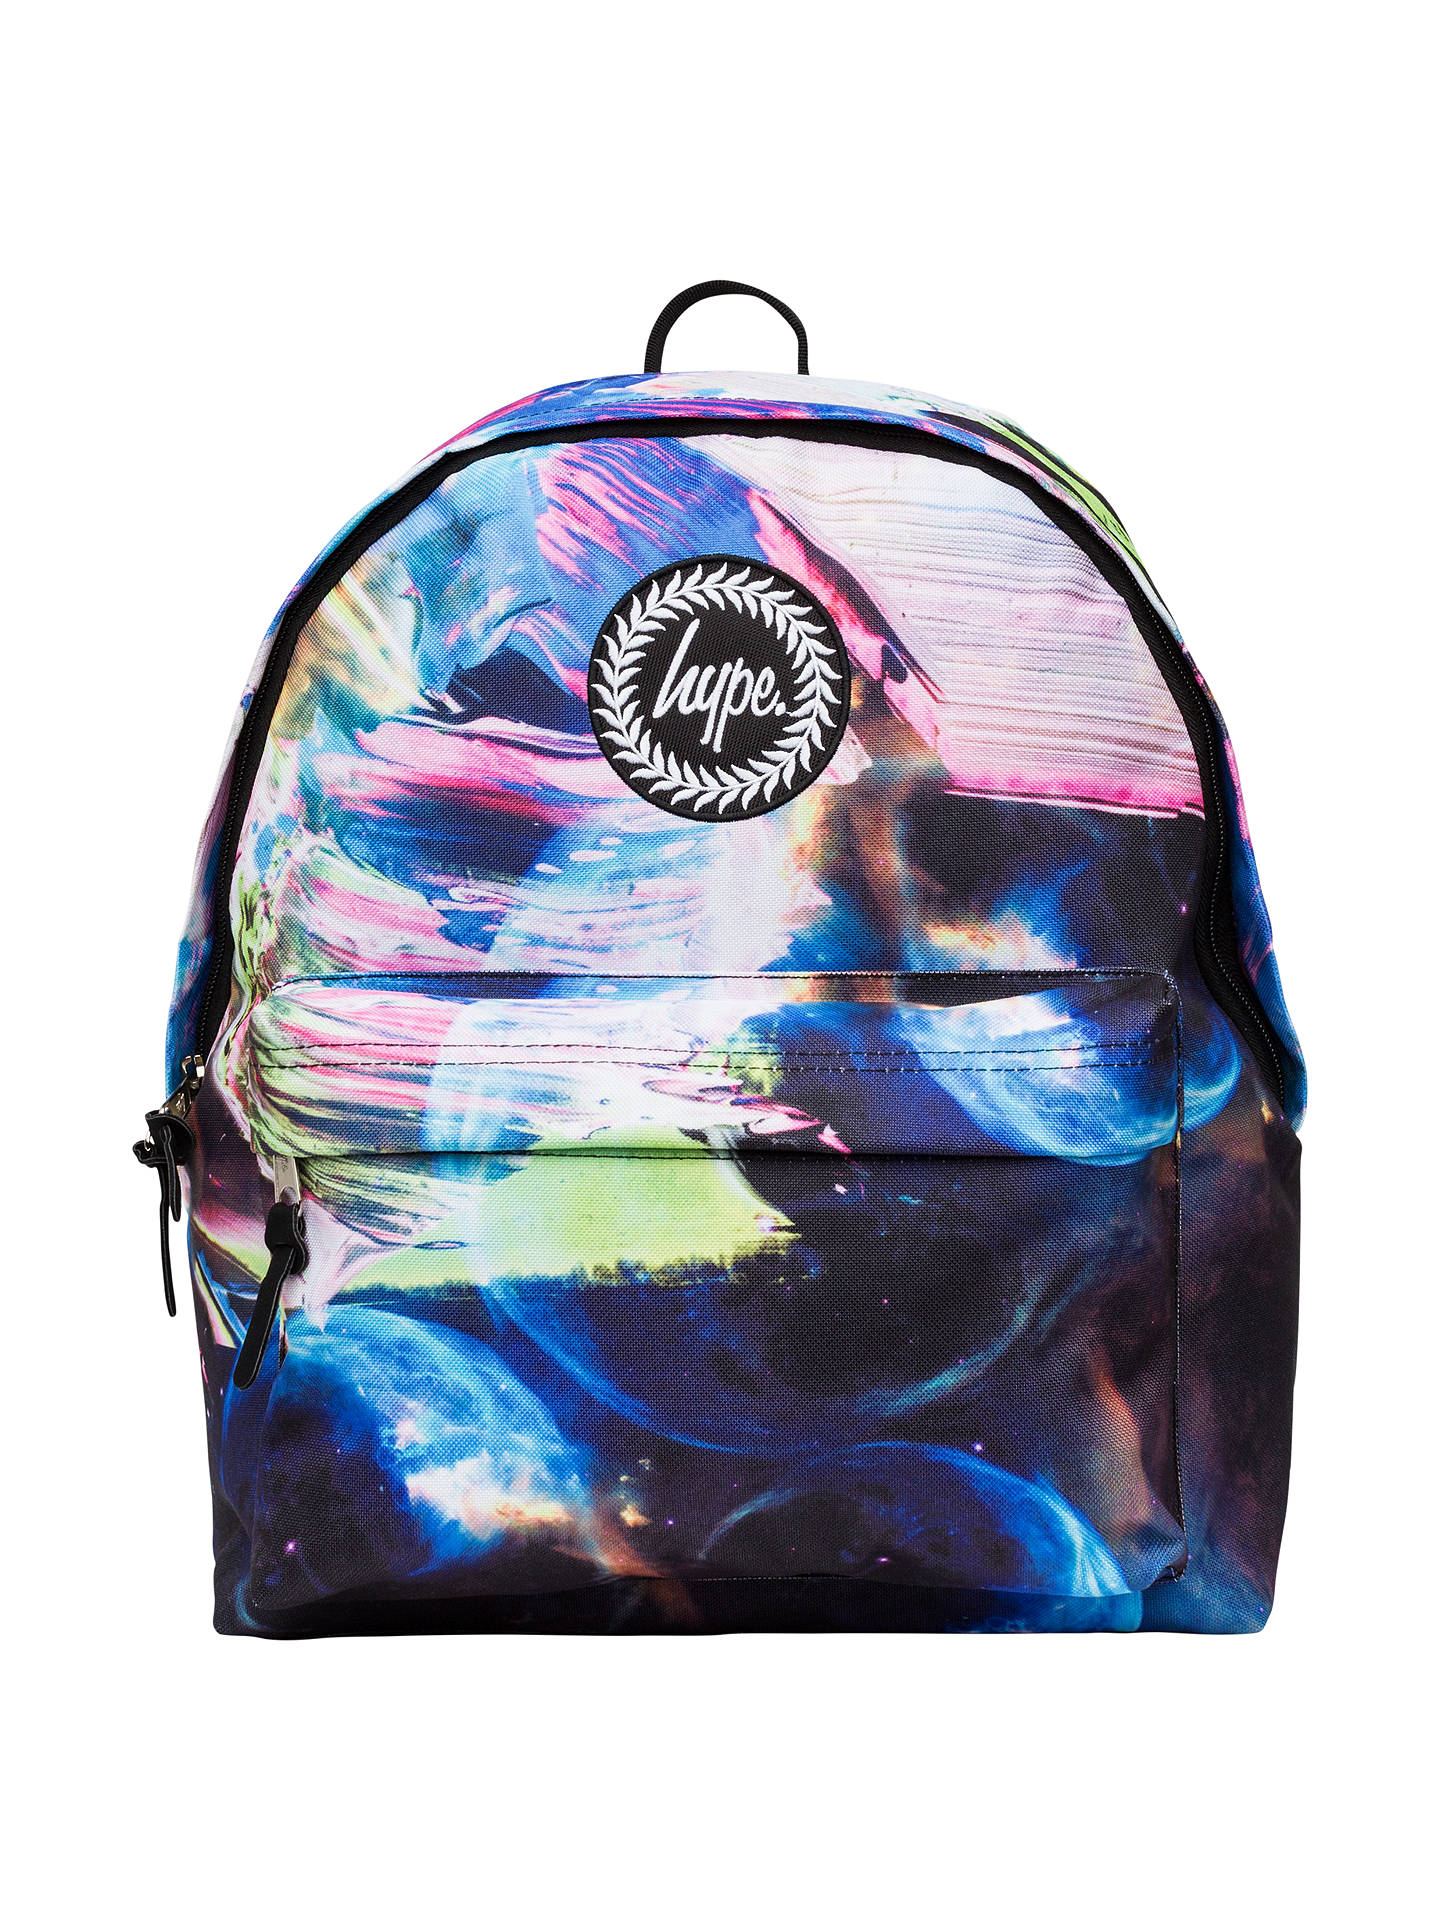 7ec4316f8f5b BuyHype Space Print Children s Backpack